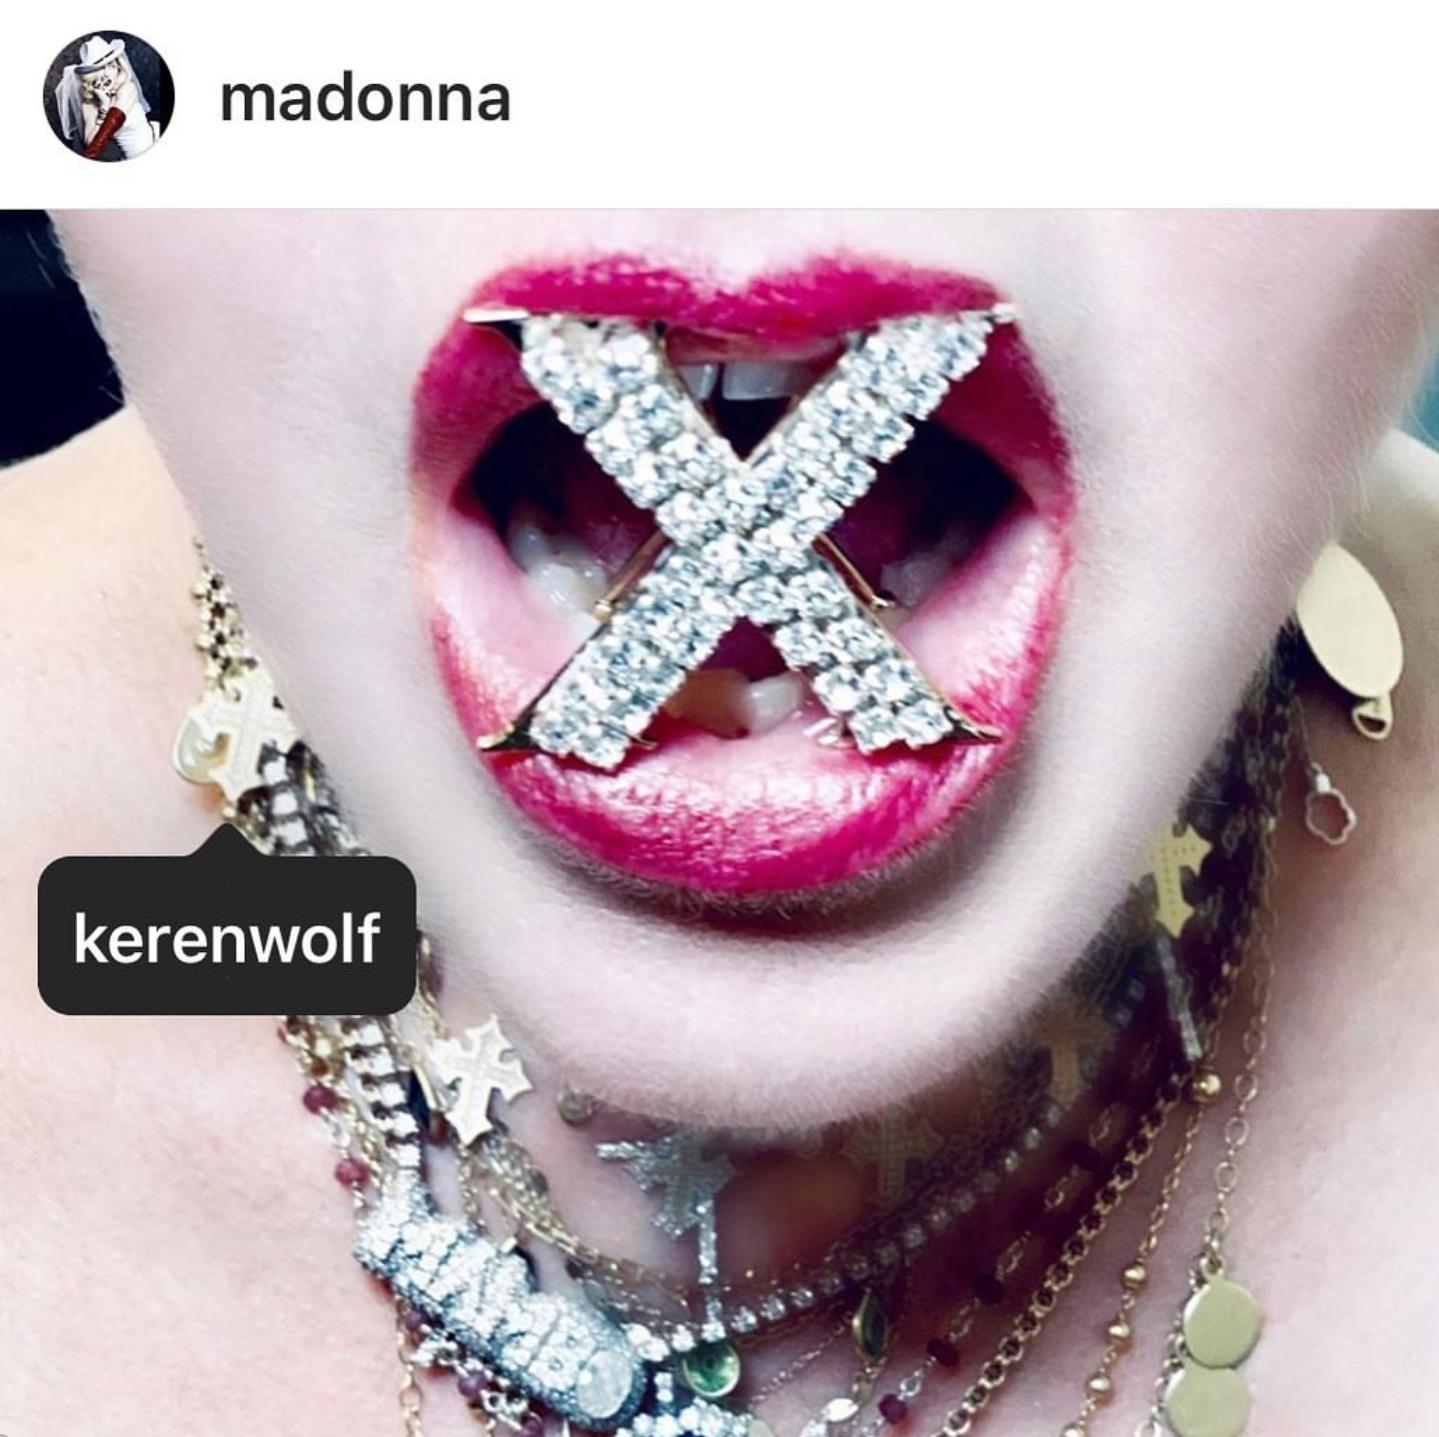 Courtesy of Instagram/  @madonna ,  @KerenWolf   @eyobyohannes